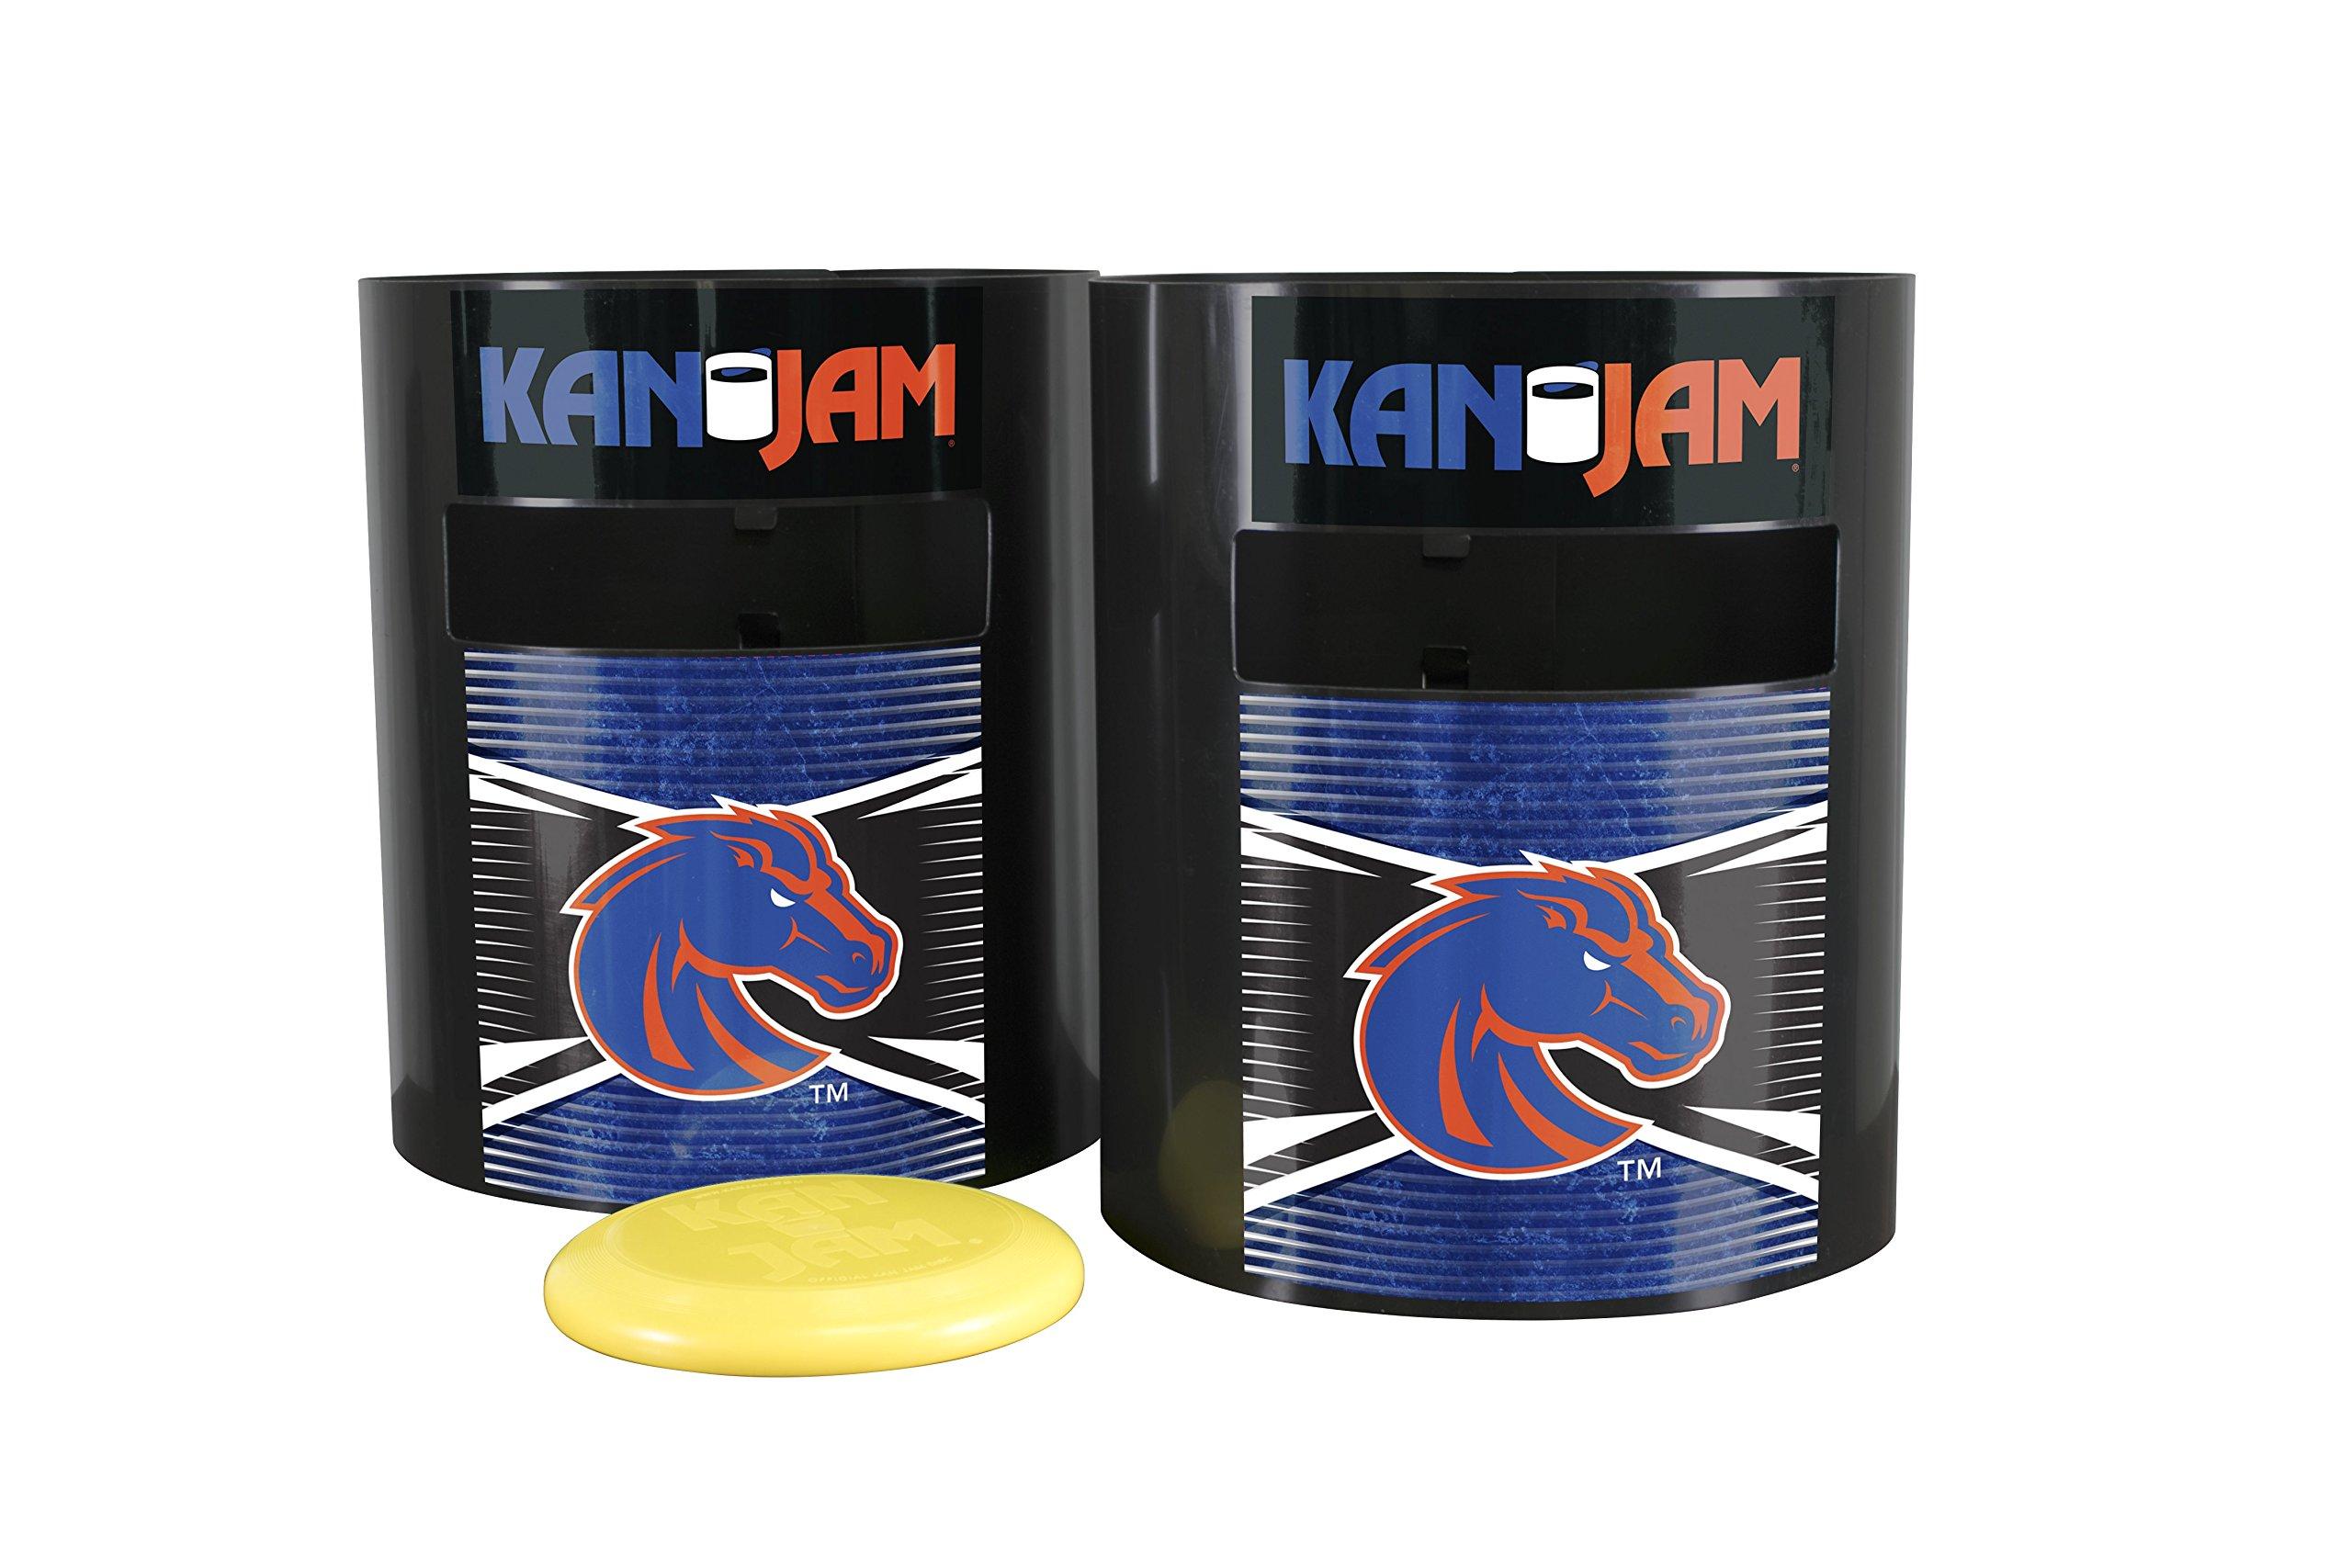 Kan Jam NCAA Boise State Broncos Disc Gameboise State Broncos Disc Game, Team Color, 11.875'' x 20'' x 9''